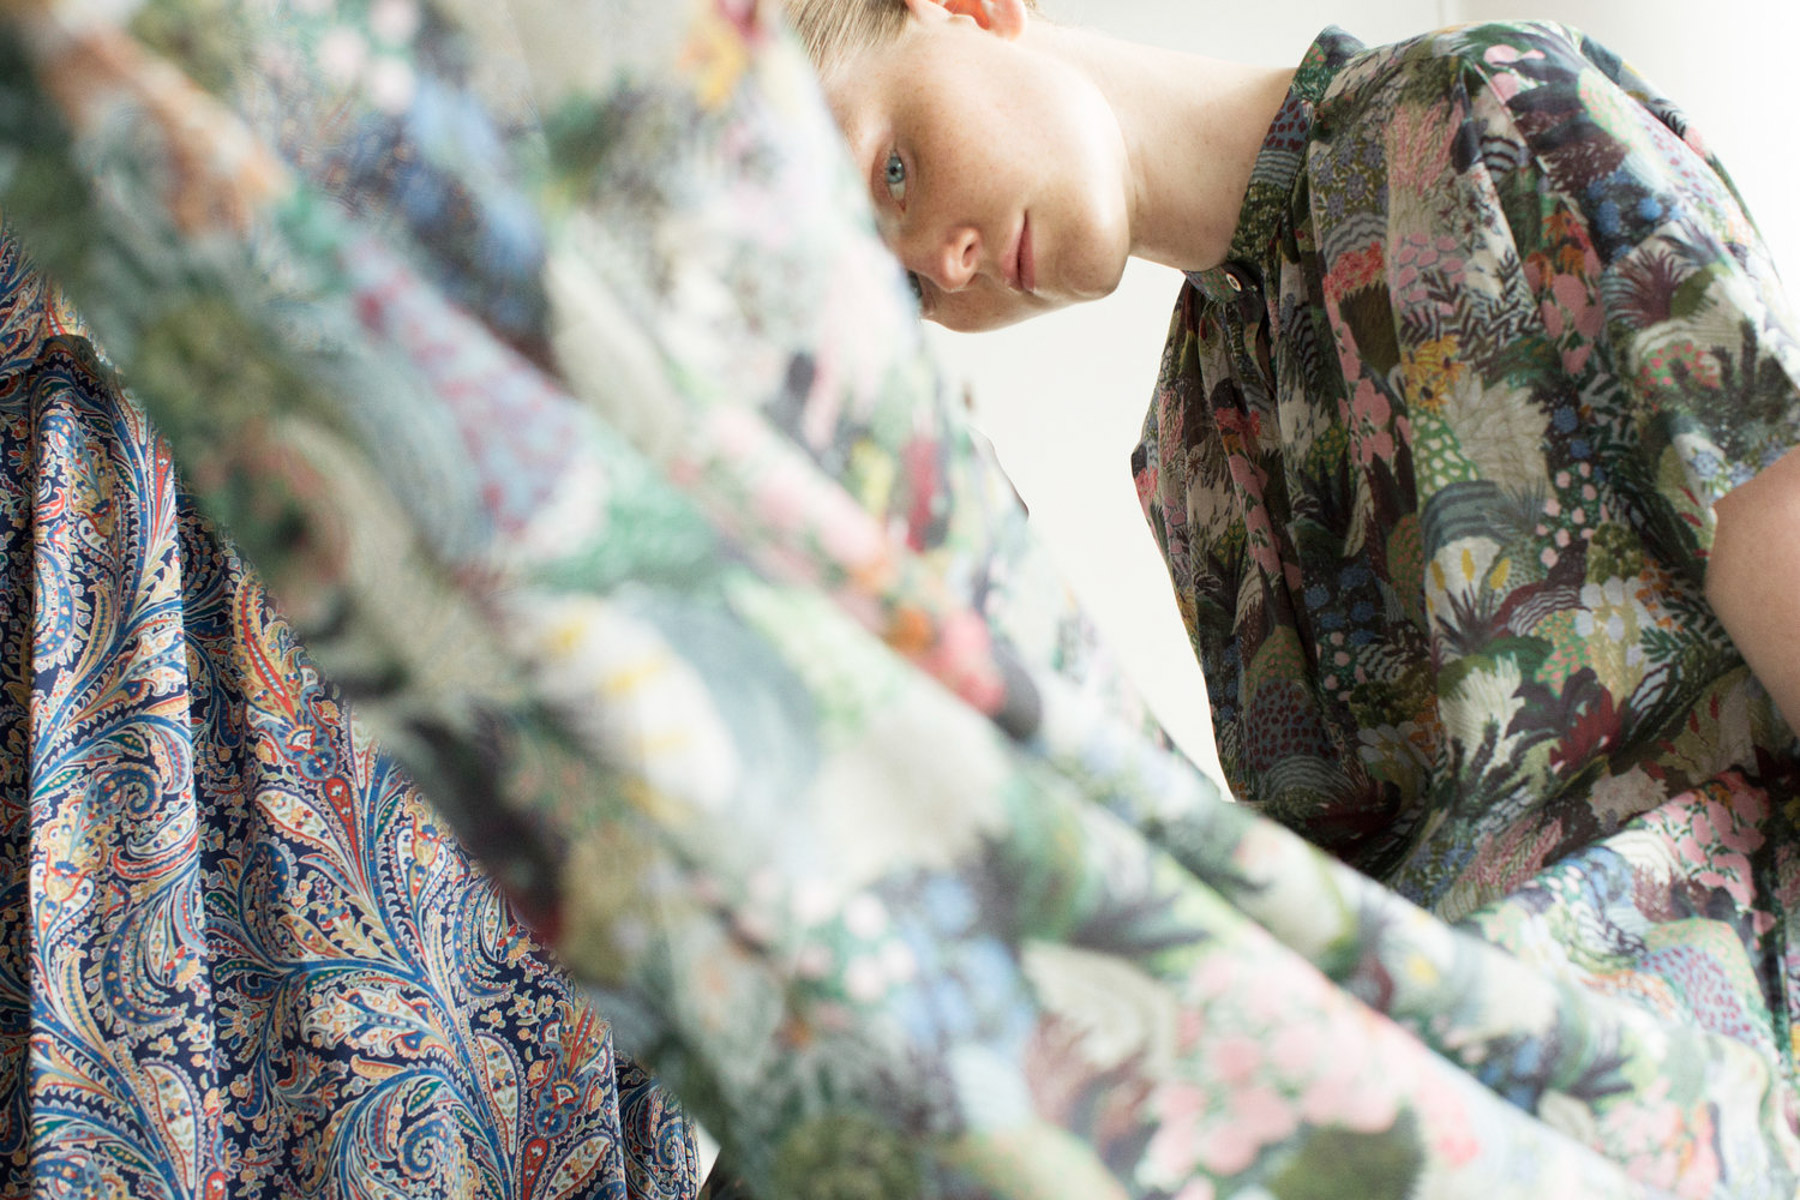 Textil diseñado por Boccaccini Meadows http://www.boccaccinimeadows.com/